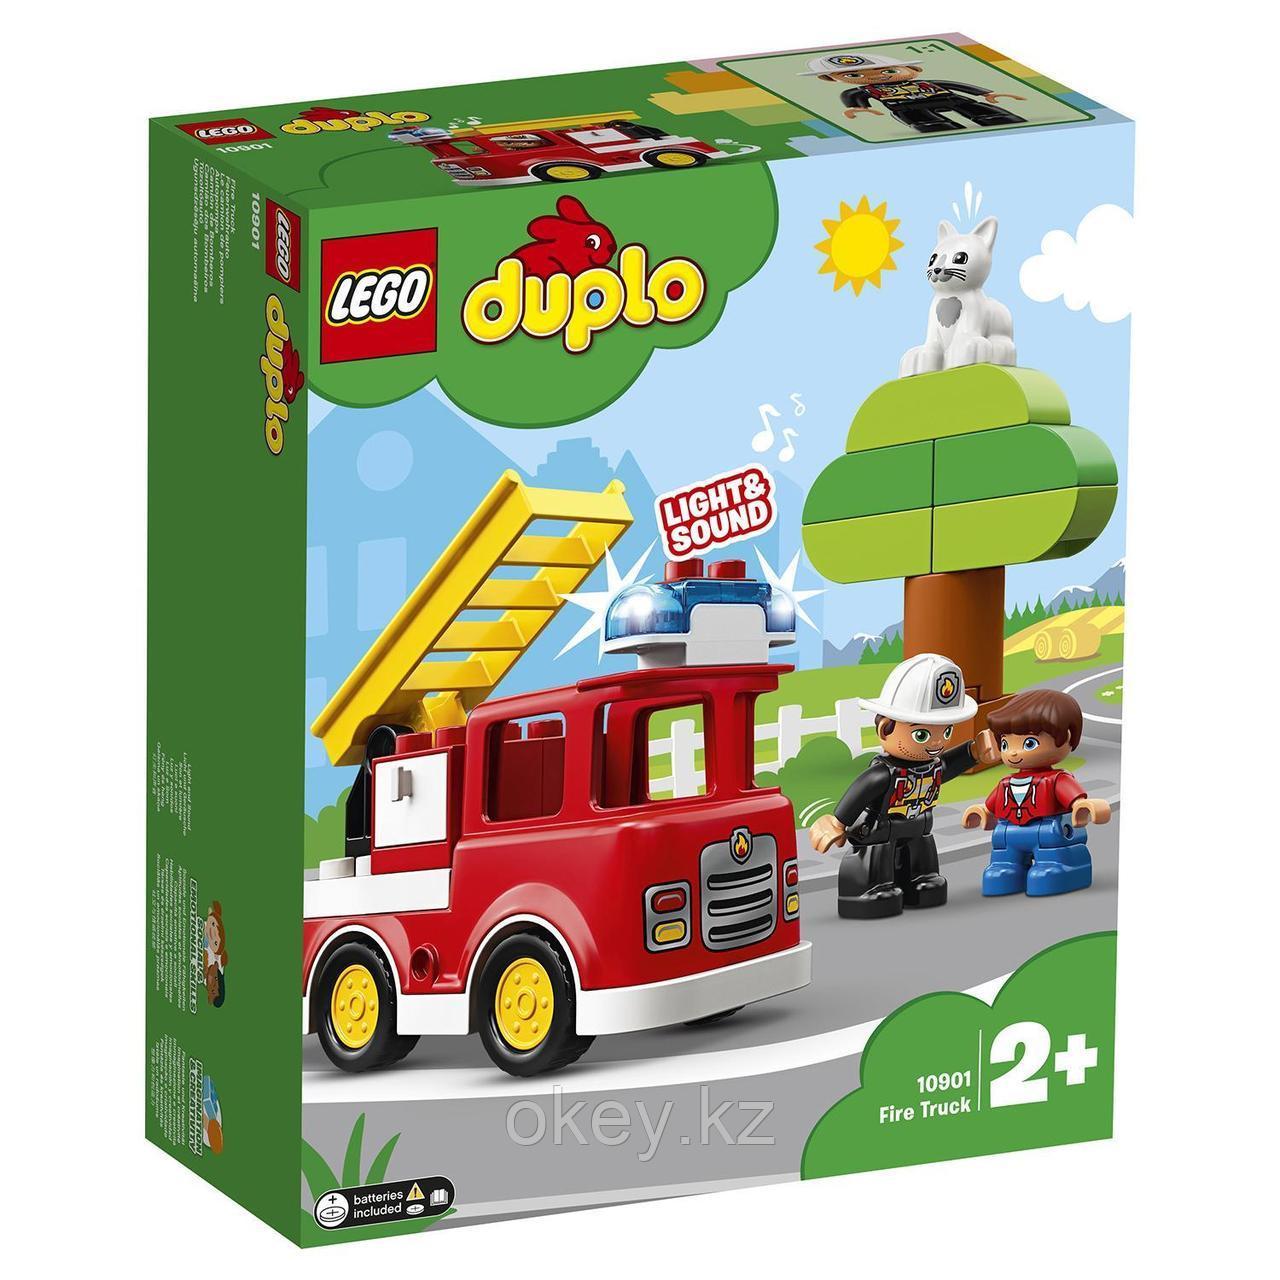 LEGO Duplo: Пожарная машина 10901